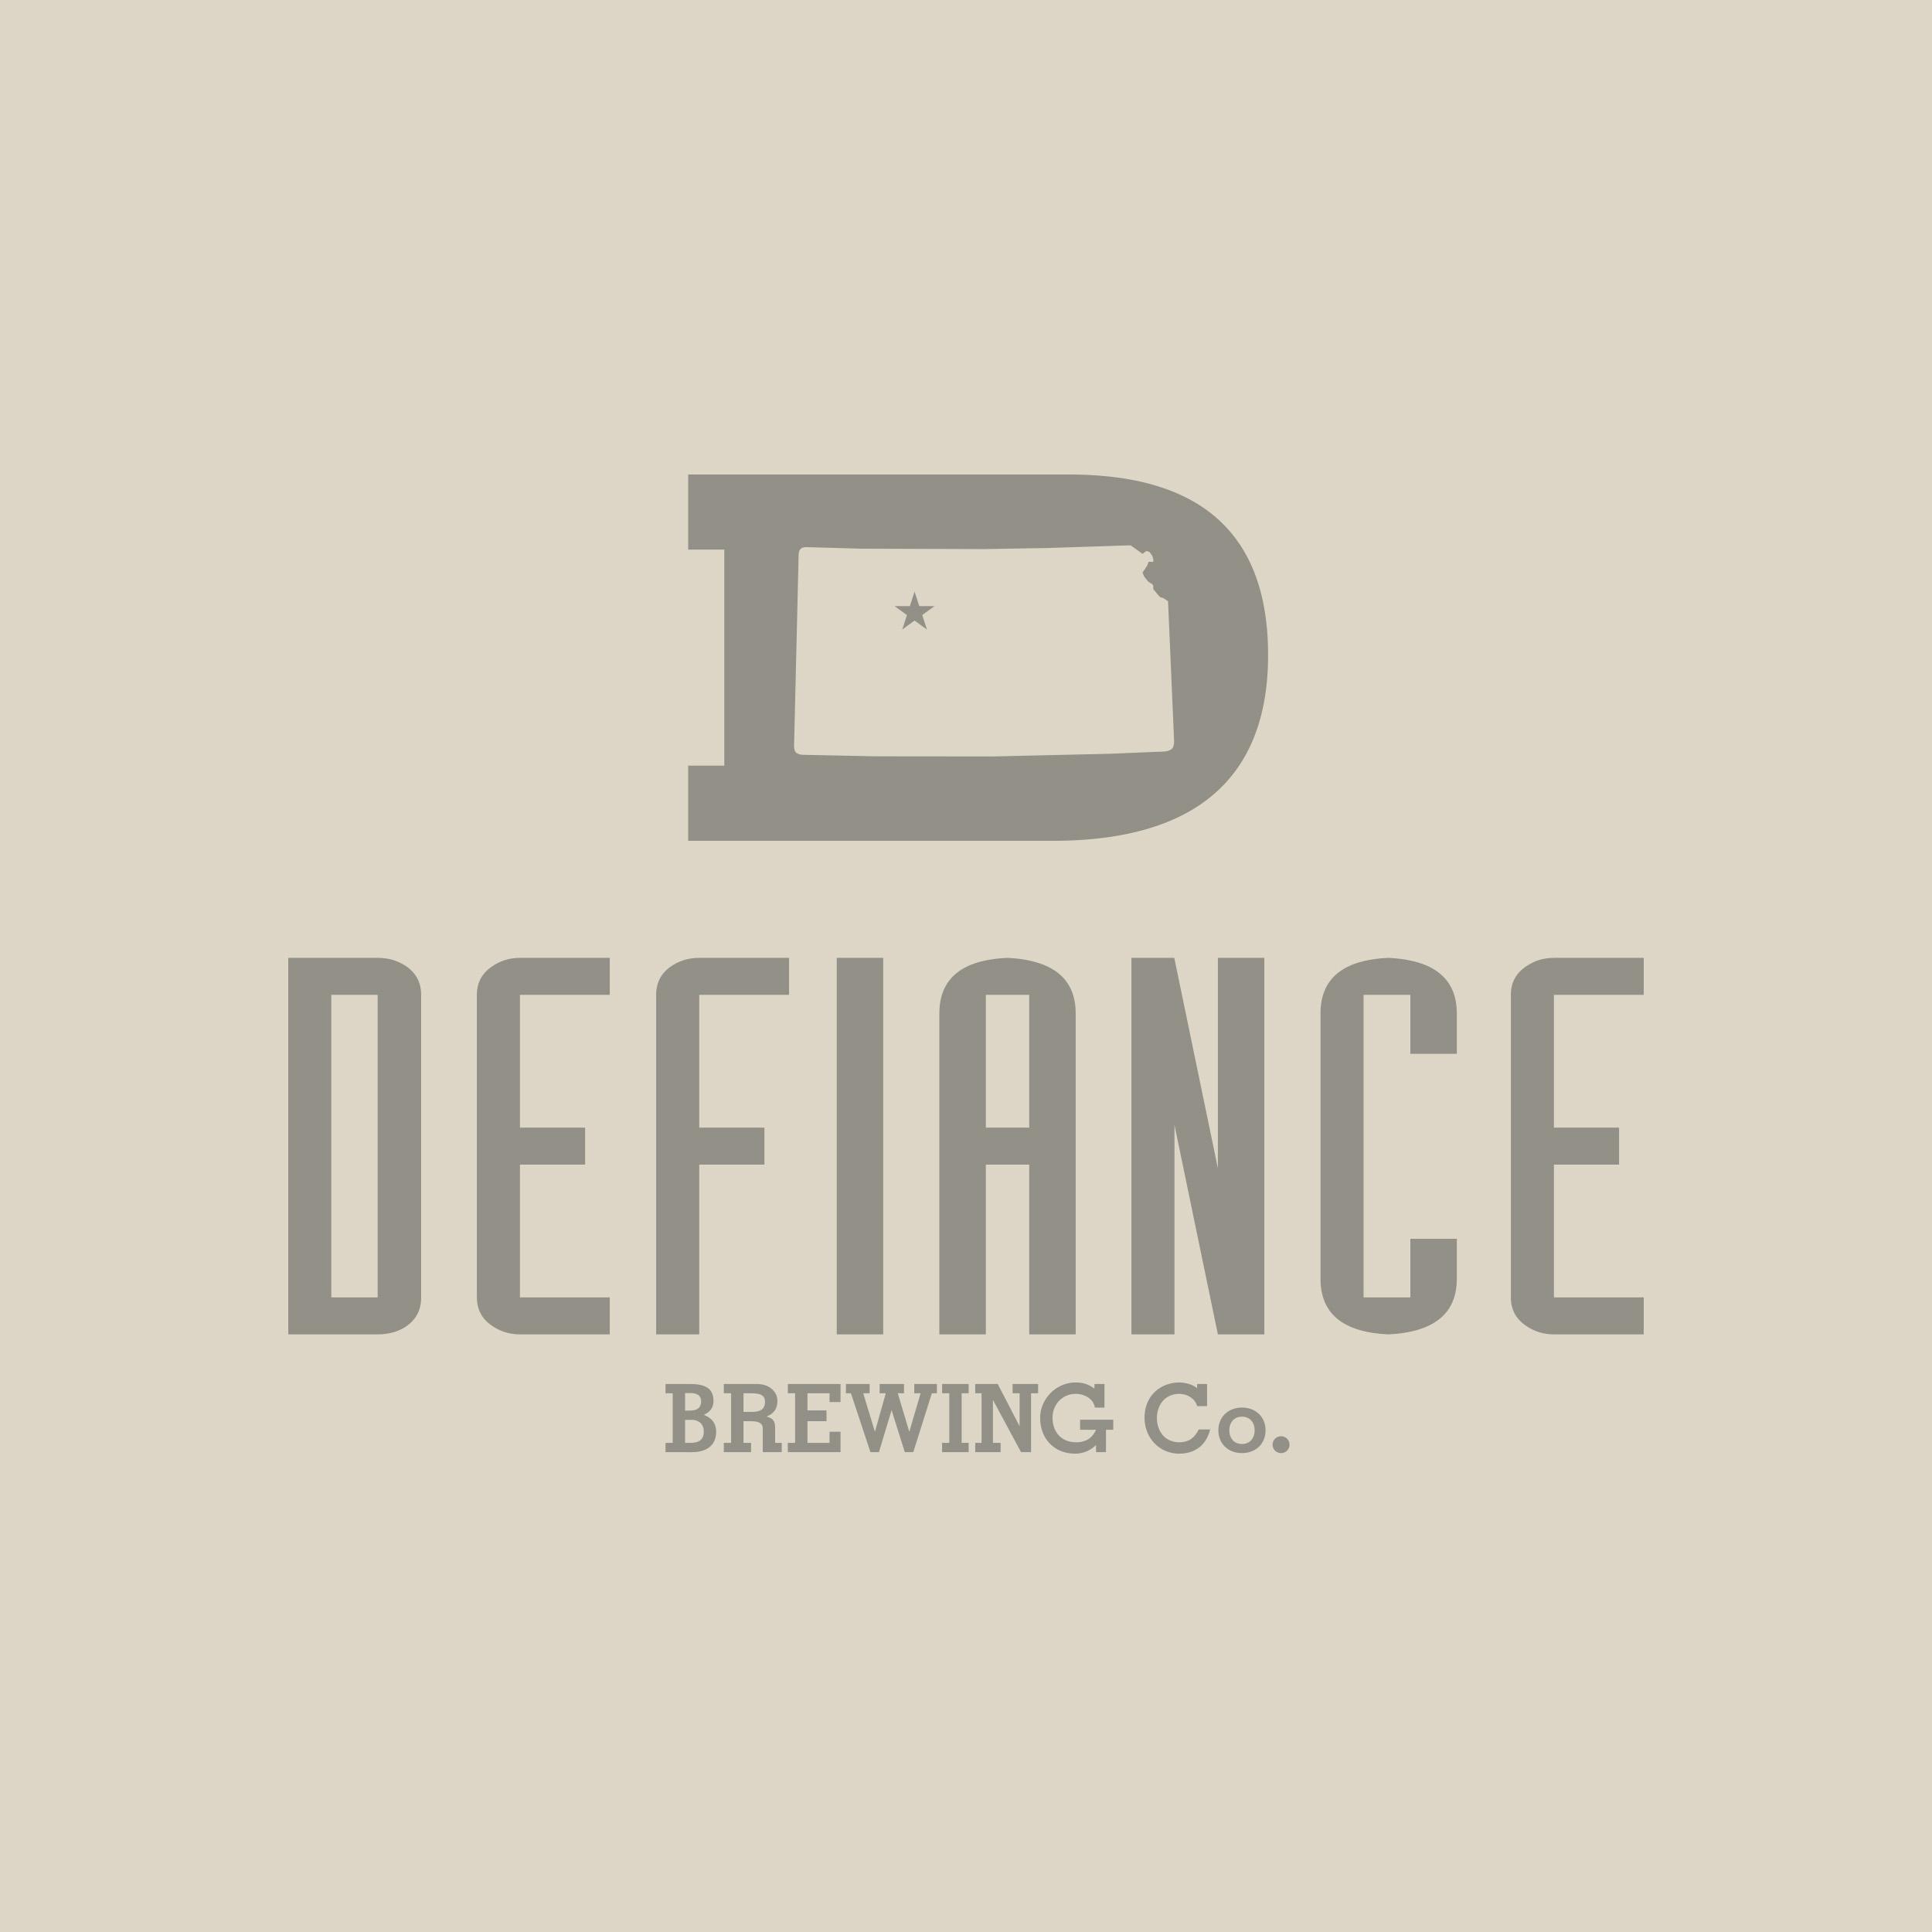 logos_0011_defiance_2.jpg